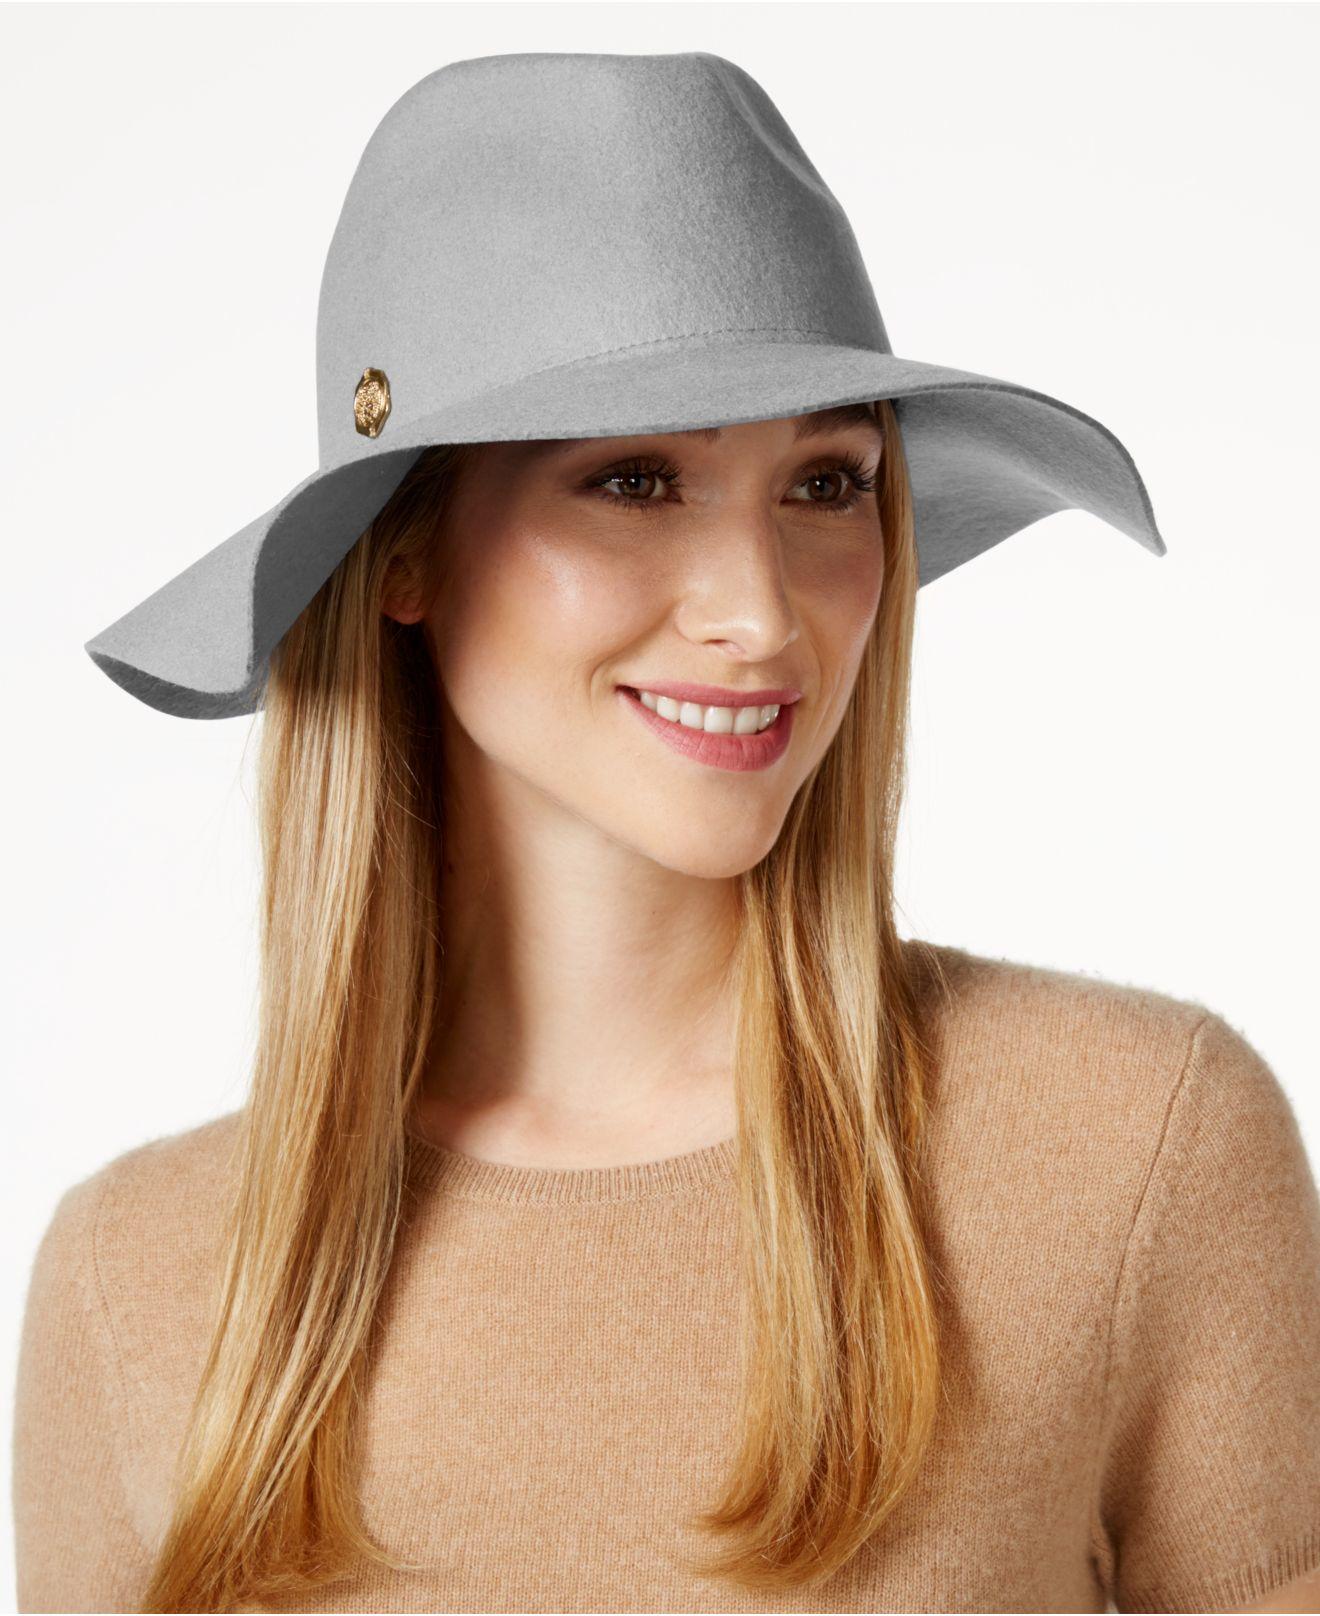 Lyst - Vince Camuto Wool Felt Panama Hat in Gray 0ff18f2b899